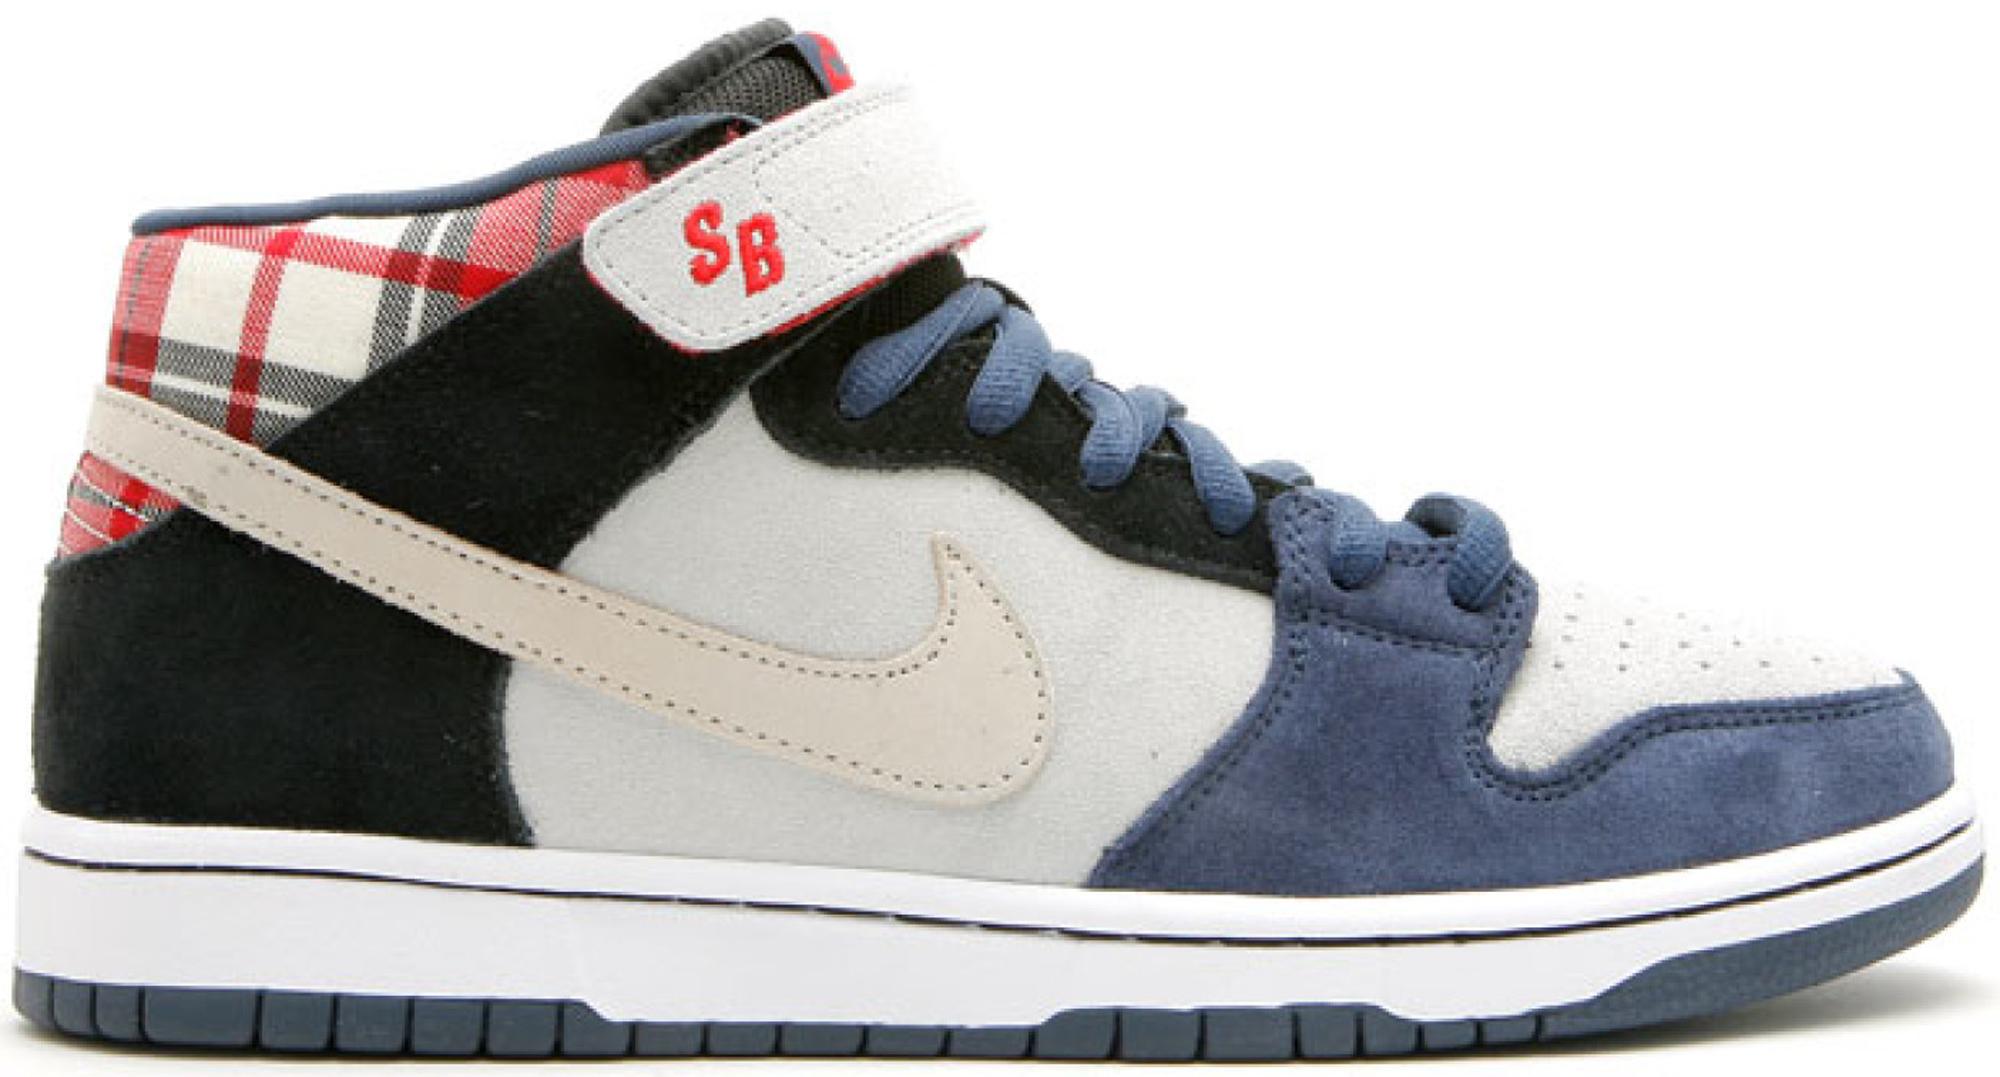 Nike SB Dunk Mid Goofy Boy - 314381-021